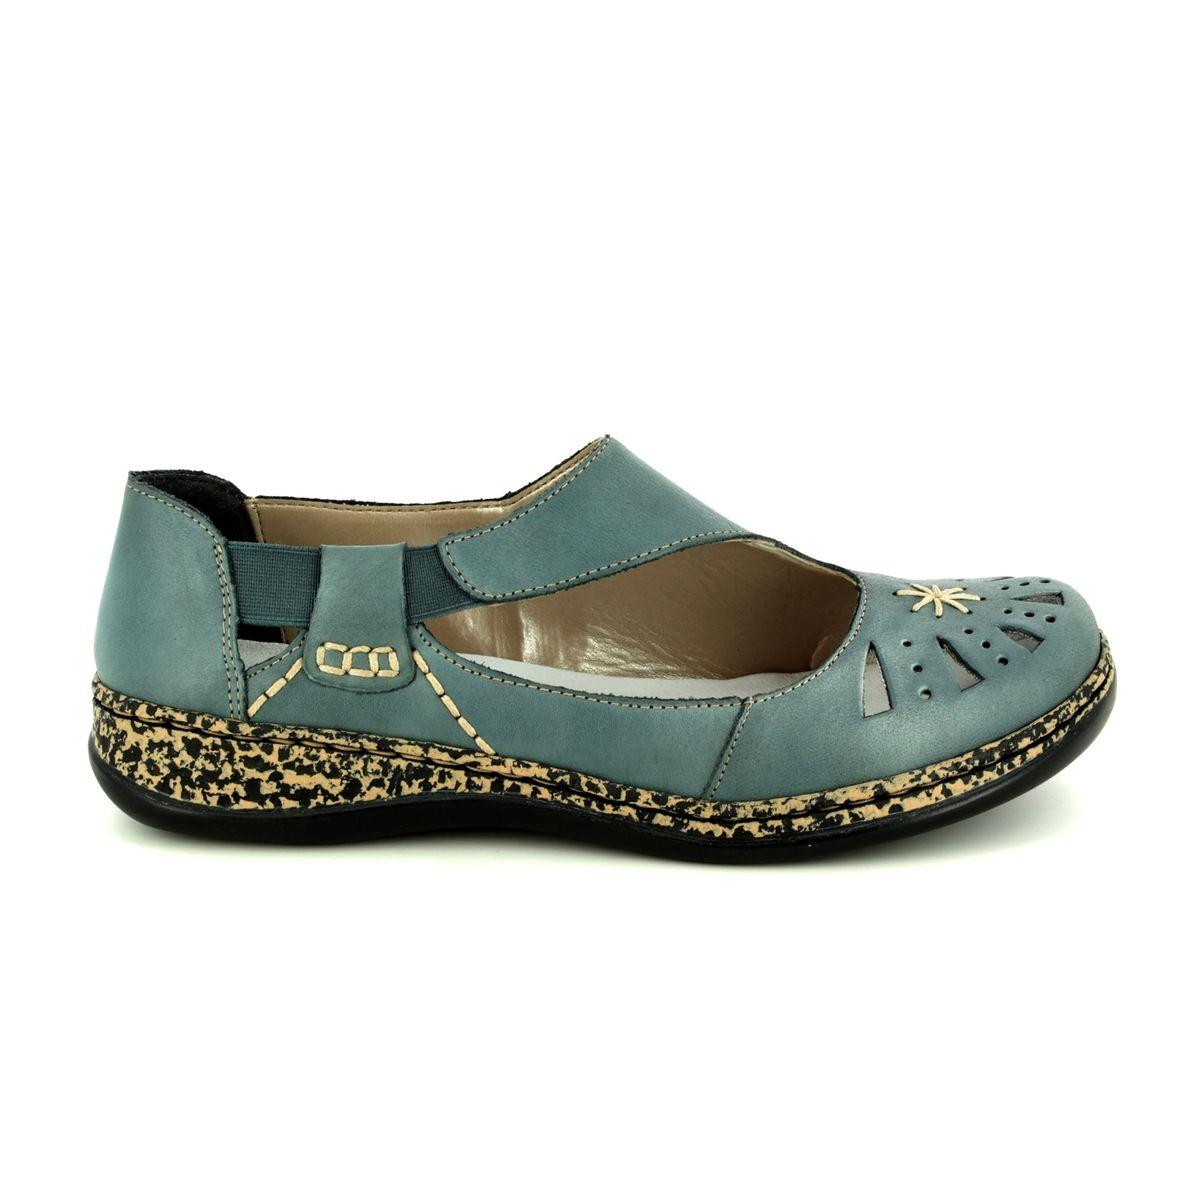 7290adc964 Rieker Mary Jane Shoes - Denim blue - 46315-12 DAISROTO